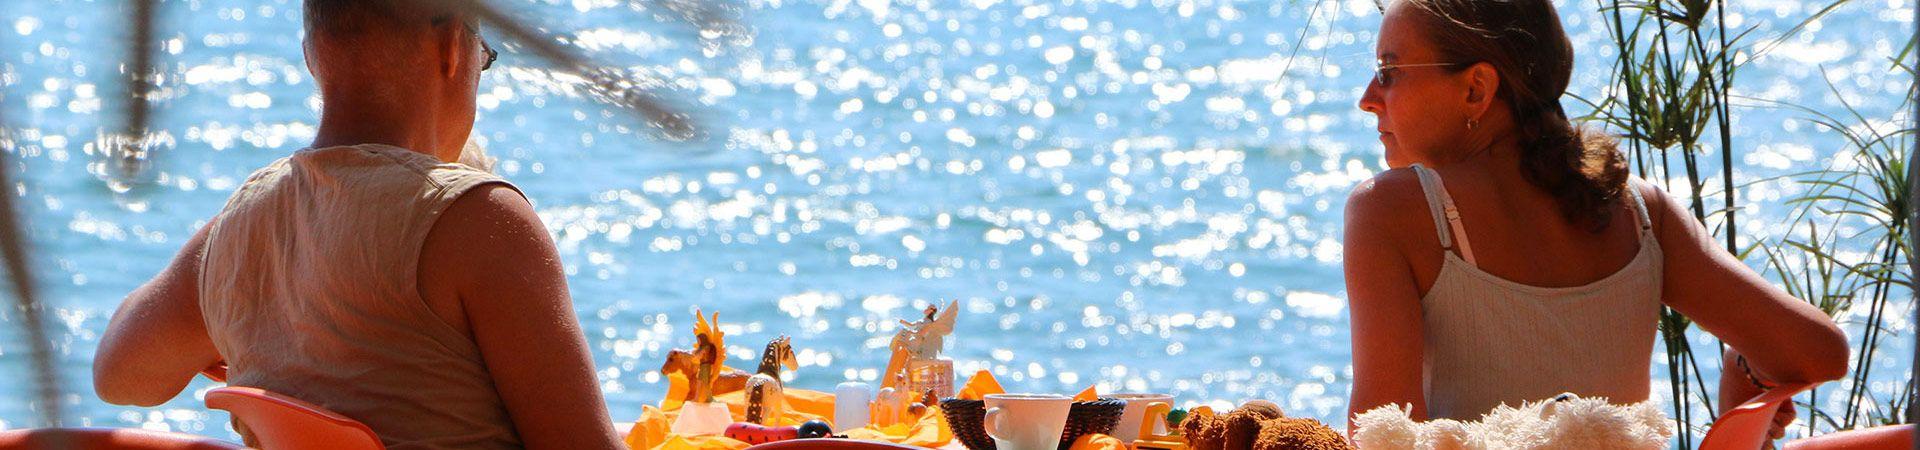 paillote-bord-de-mer-camping-merendella